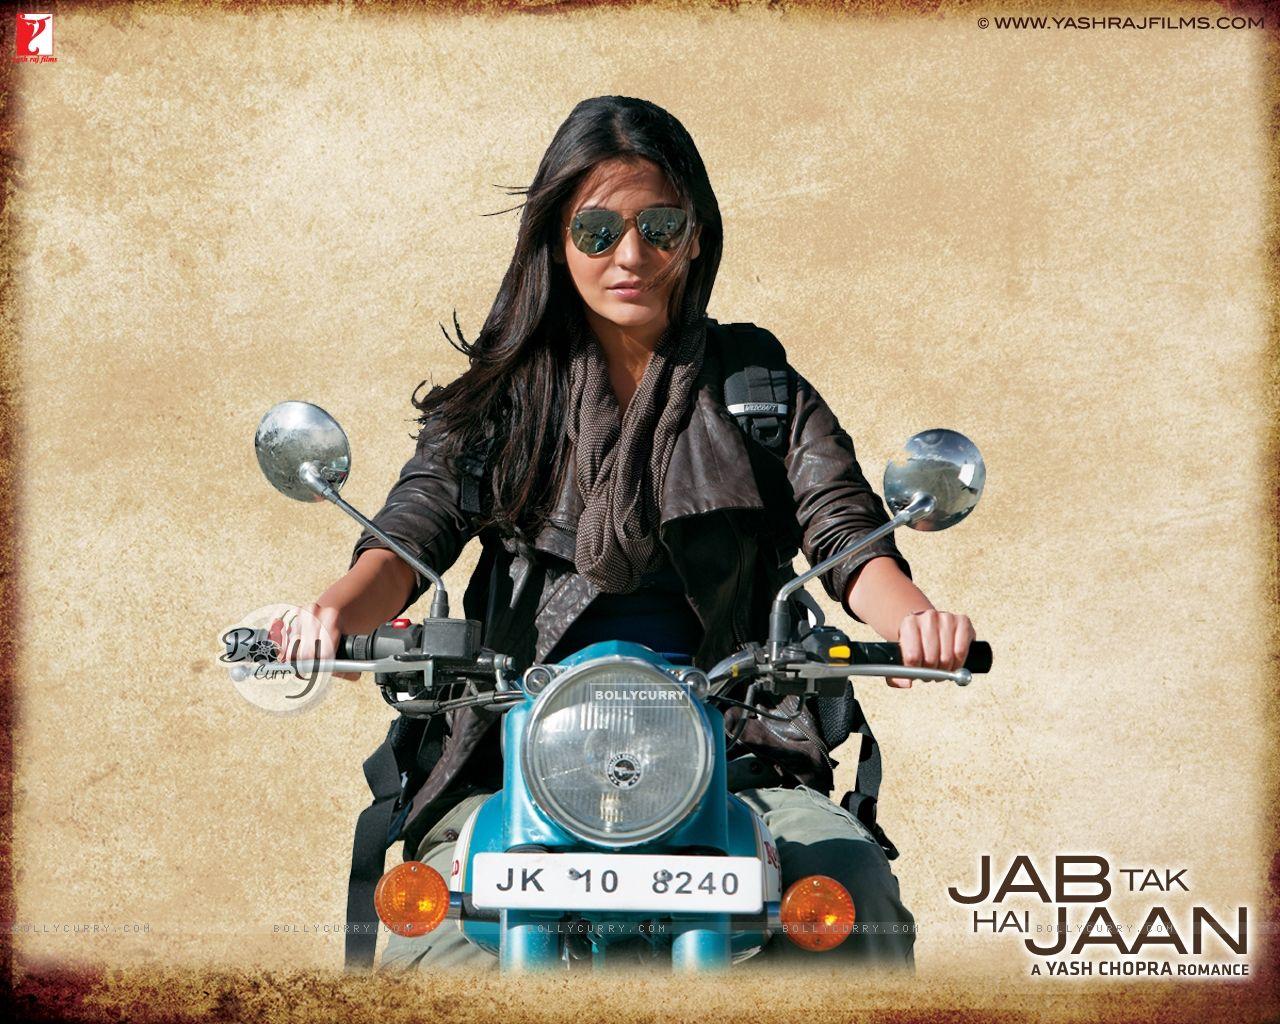 Wallpaper - Anushka Sharma in Jab Tak Hai Jaan (232799 ...